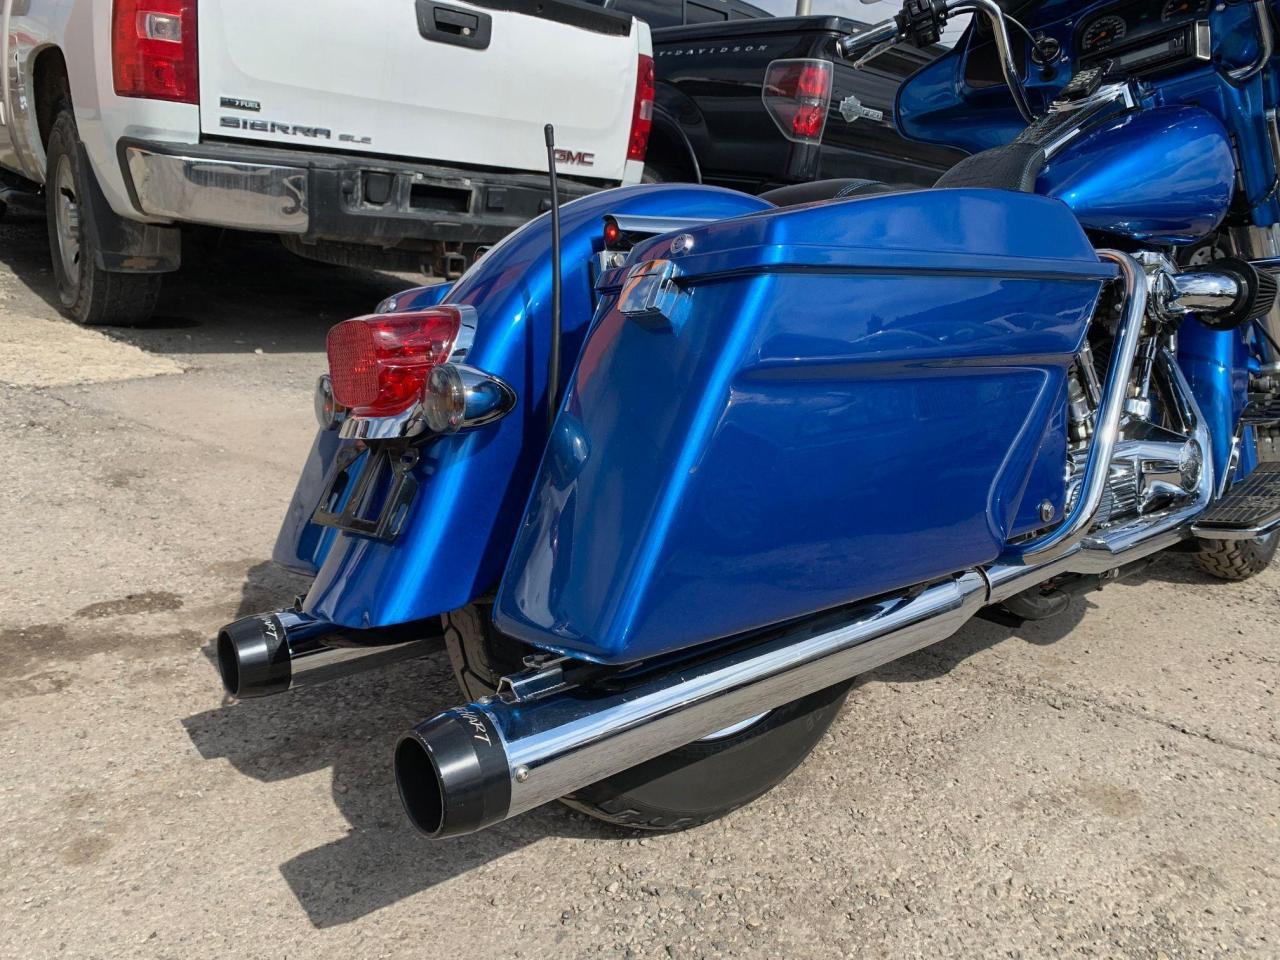 1992 Harley-Davidson Electra Glide